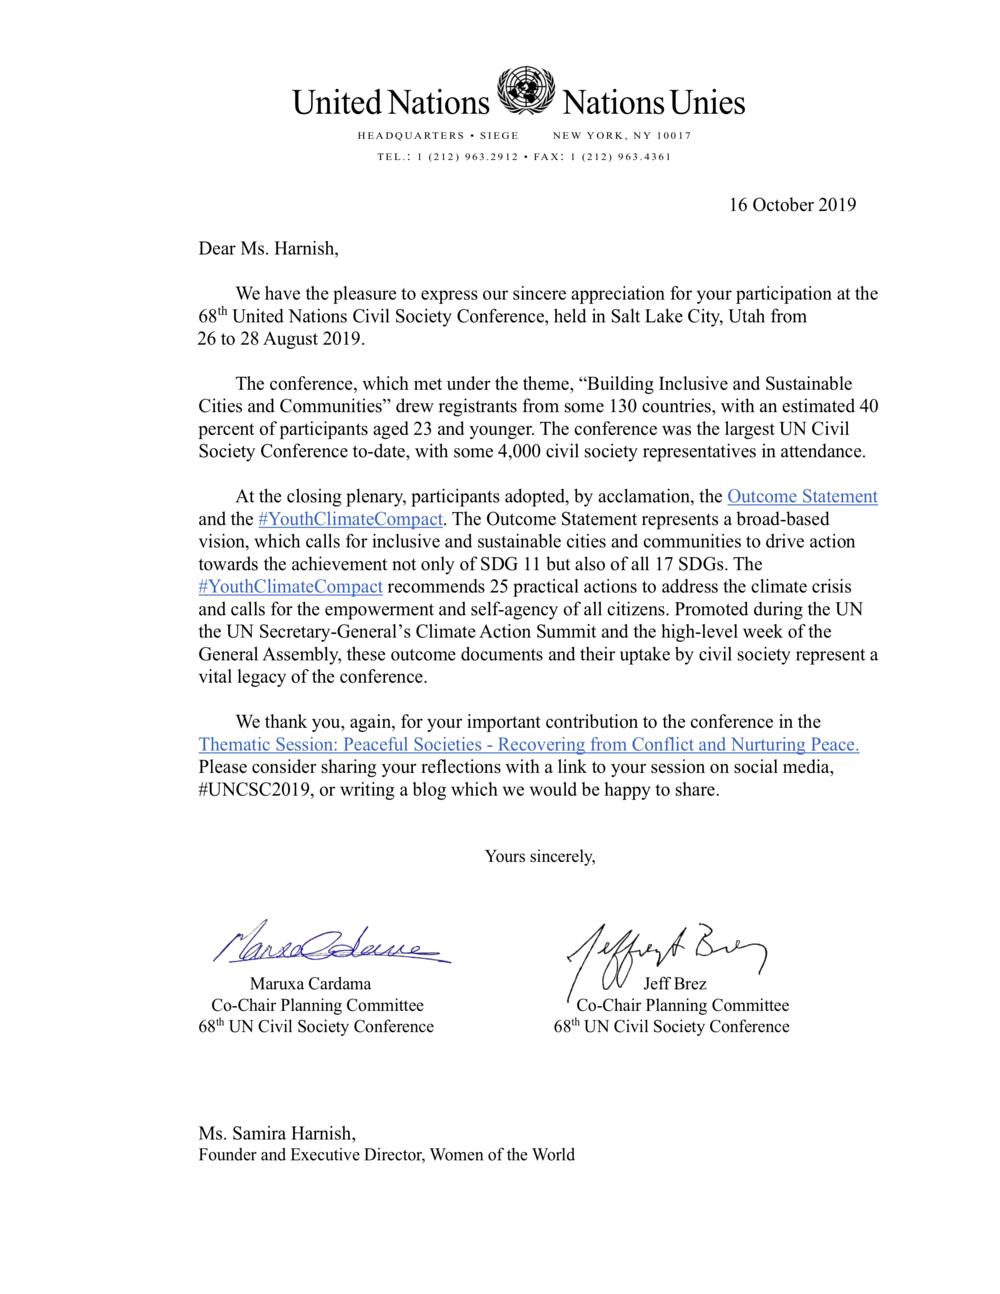 Letter of Appreciation_Ms. Samira Harnish_68th UN Civil Society Conference.png